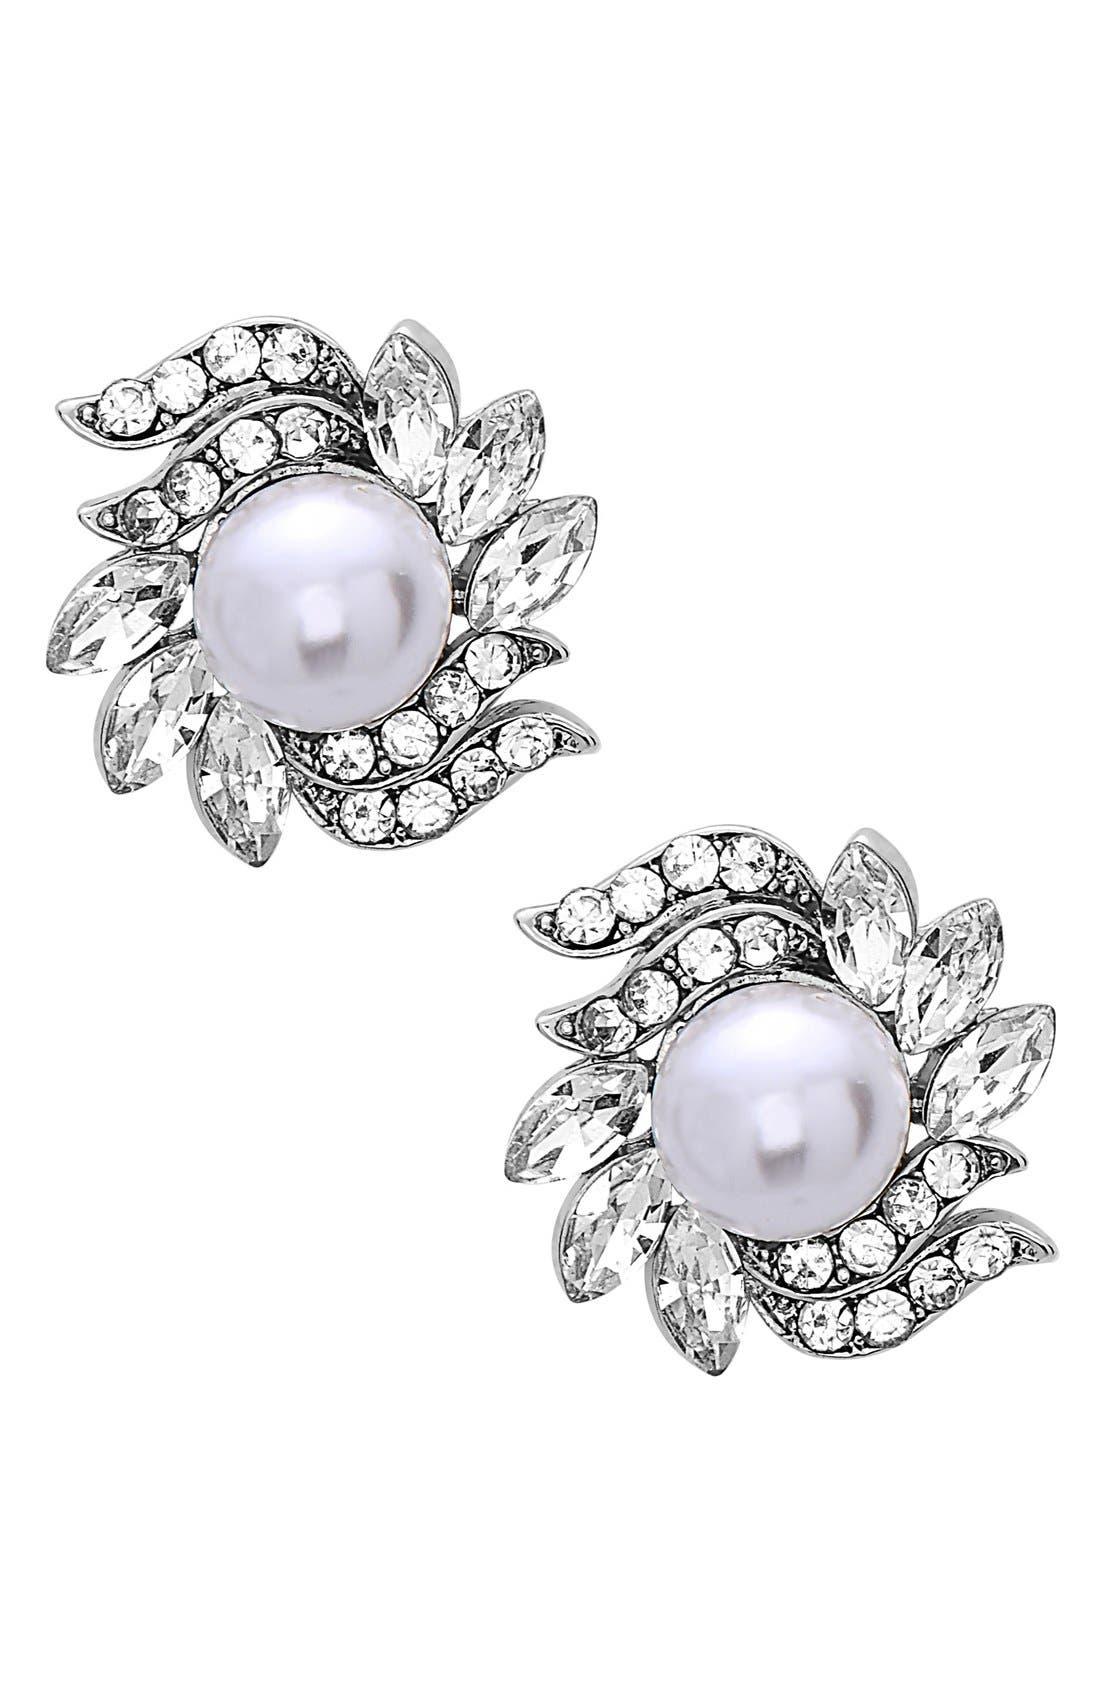 Main Image - Nina Crystal & Faux Pearl Floral Stud Earrings